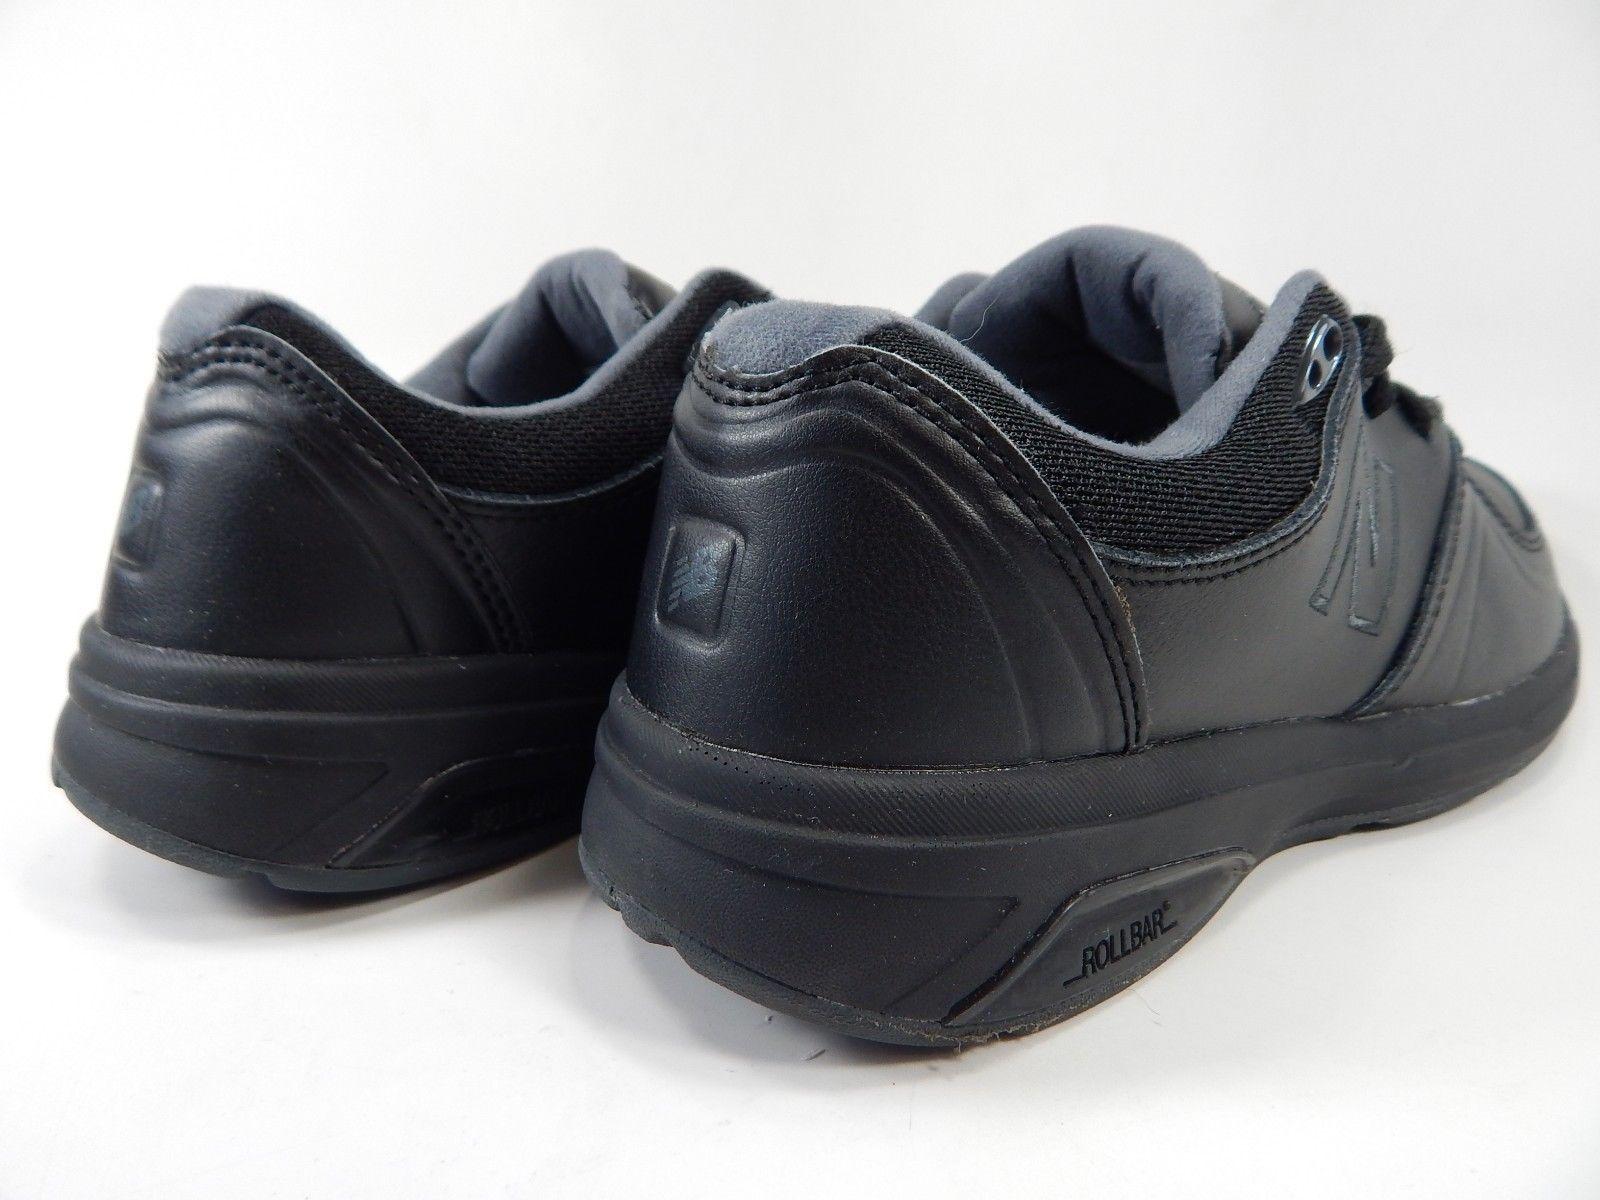 New Balance 813 Size US 7.5 2A NARROW EU 38 Women's Walking Shoes Black WW813BK